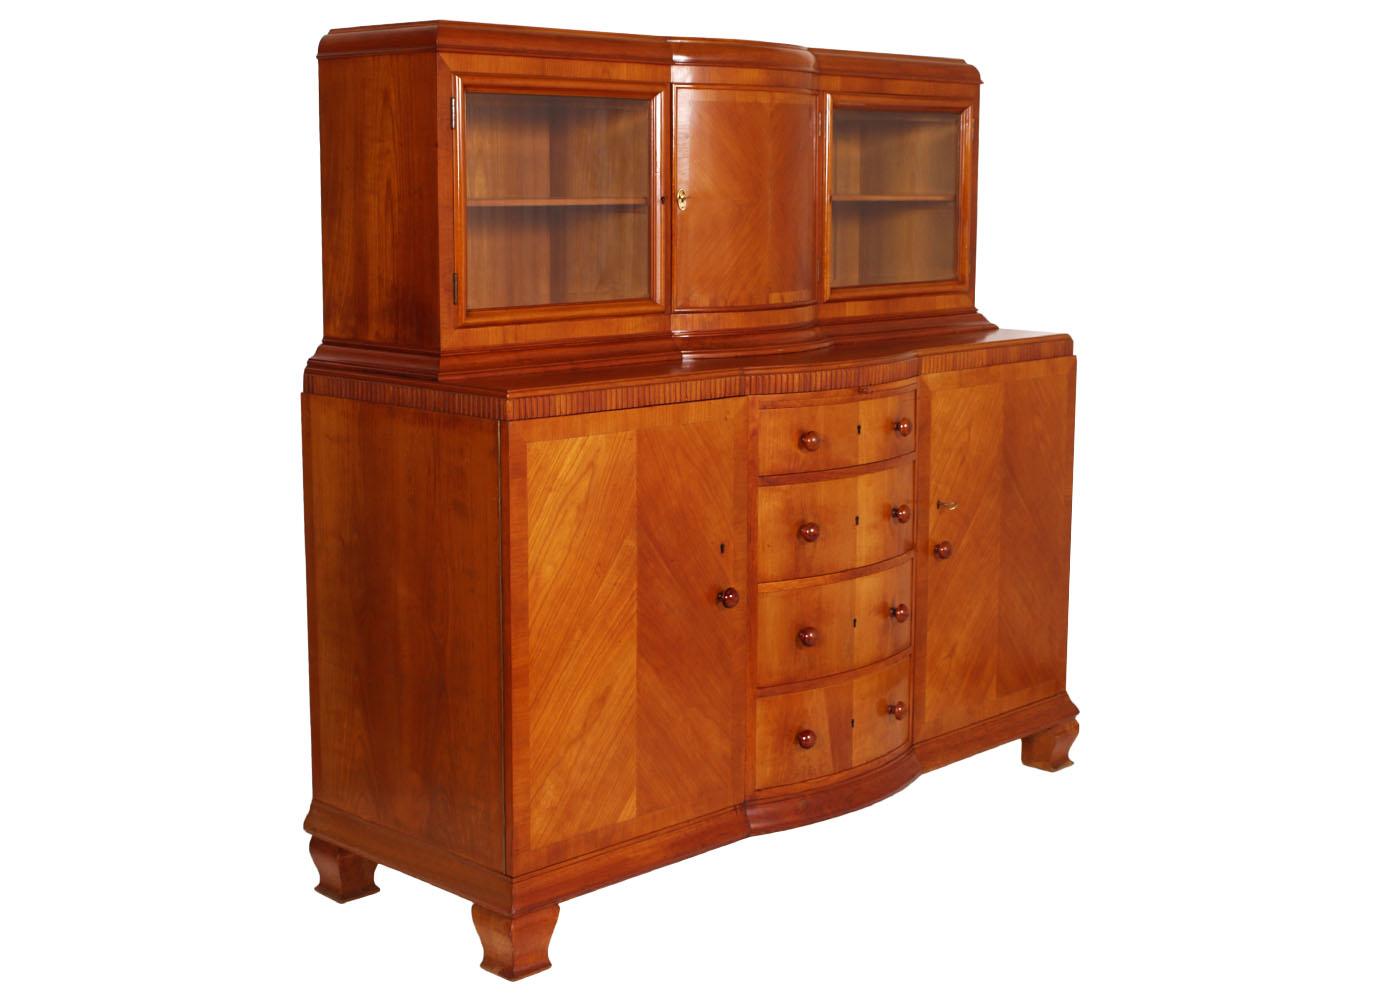 Antique Sideboard Buffet Art Deco 1930s